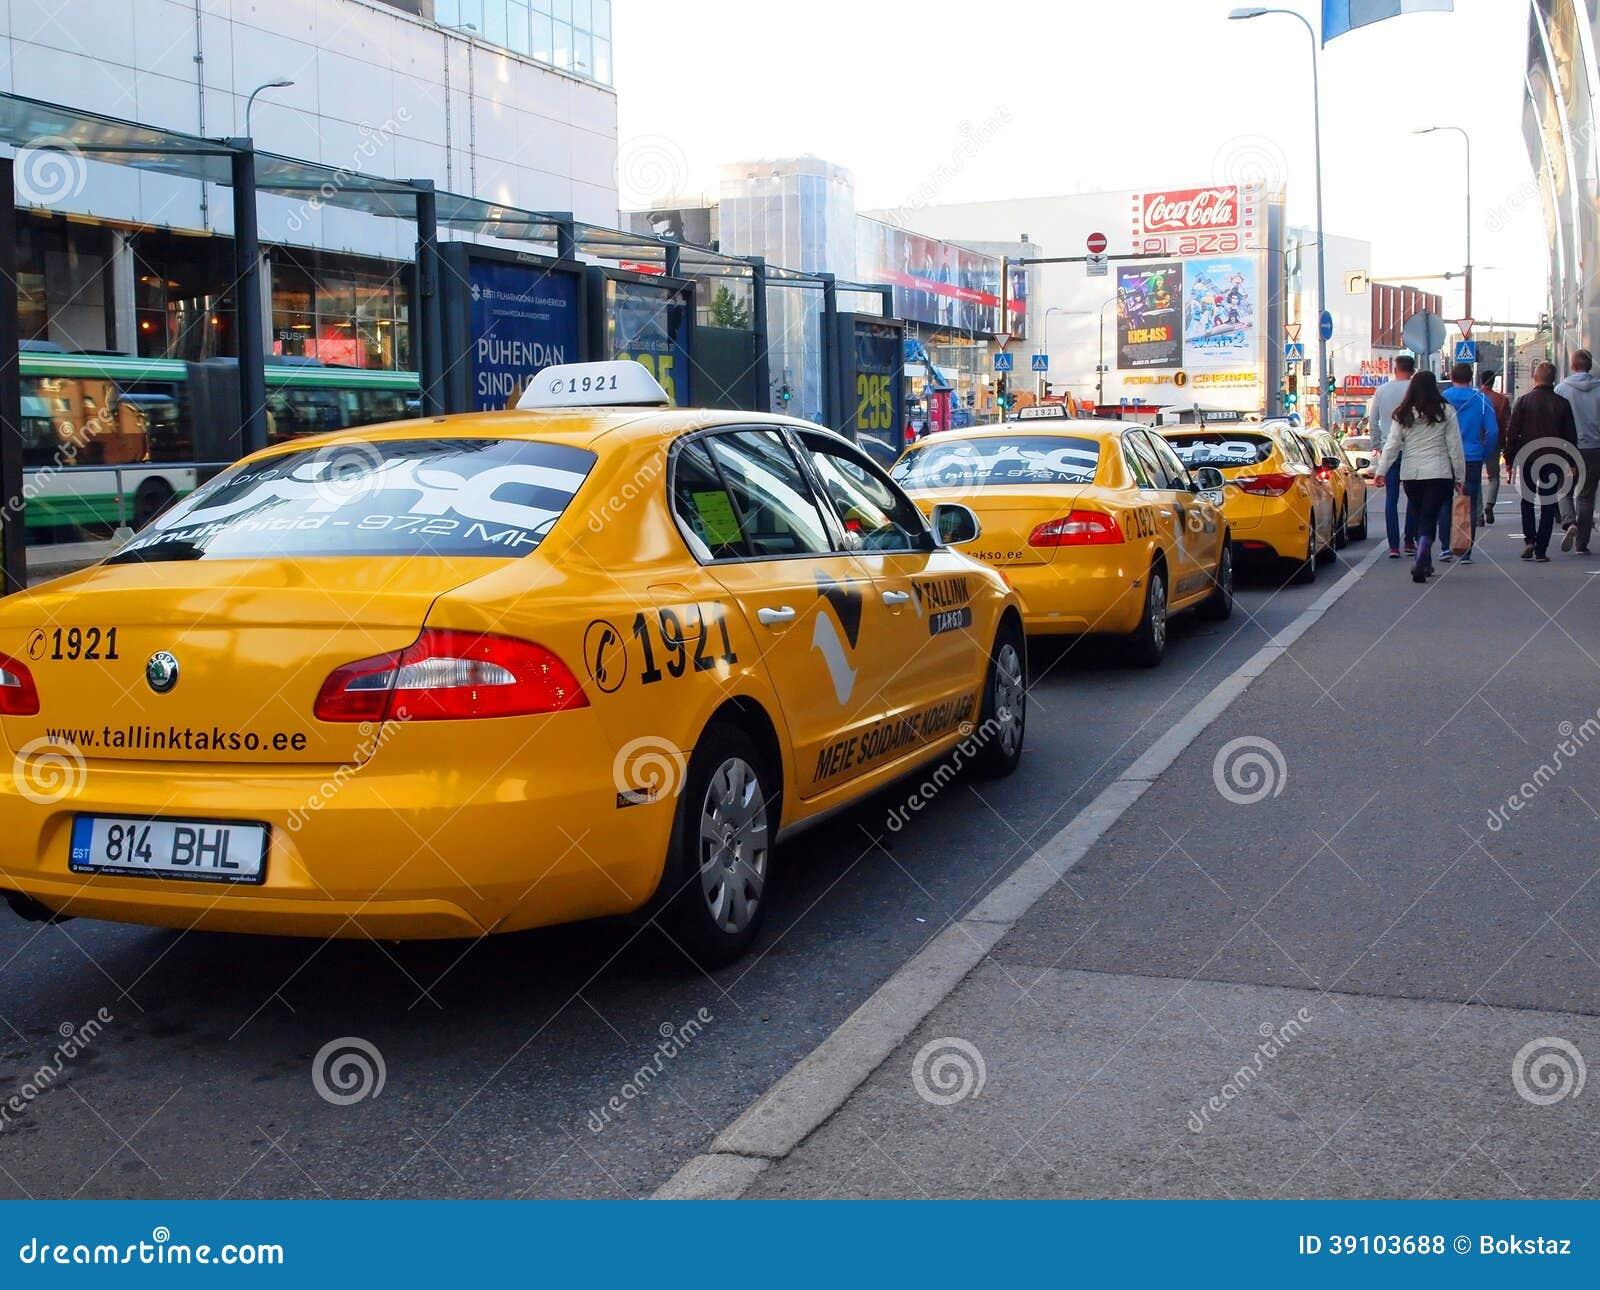 Originele gele de taxi tallink takso van Tallinn